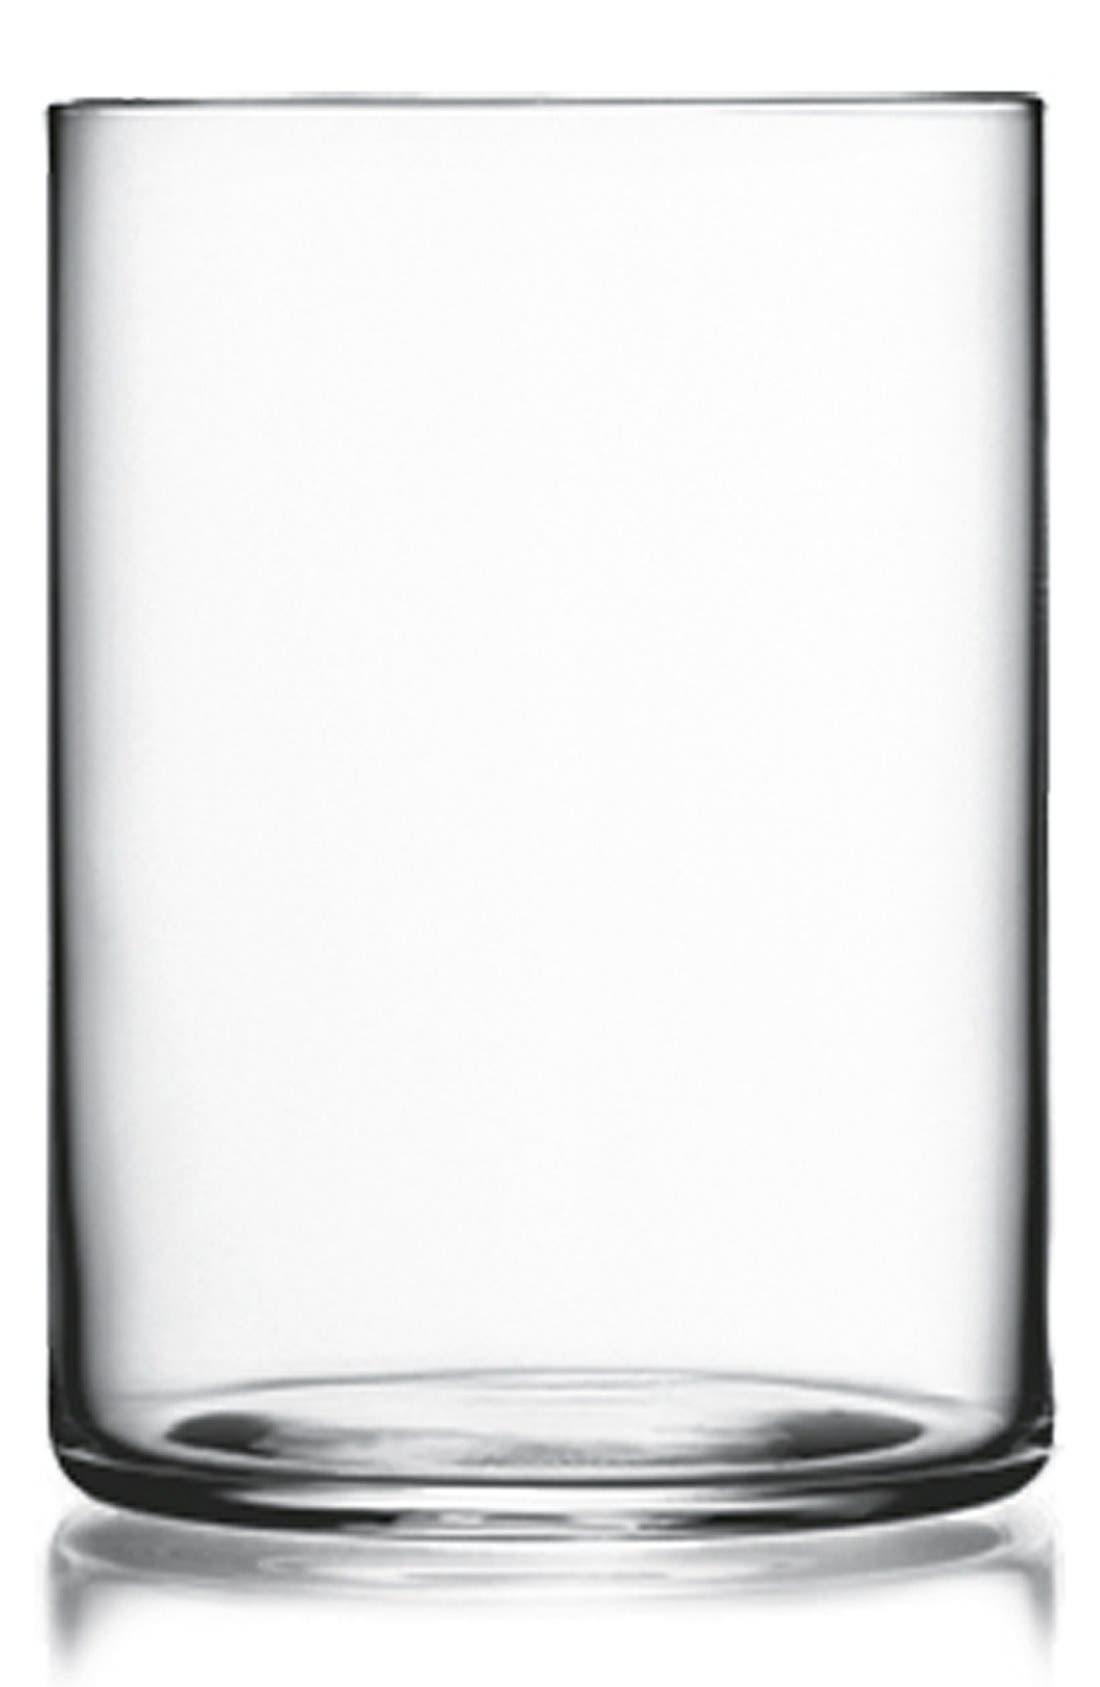 Alternate Image 1 Selected - Luigi Bormioli 'Top Class' Glasses (Set of 6)